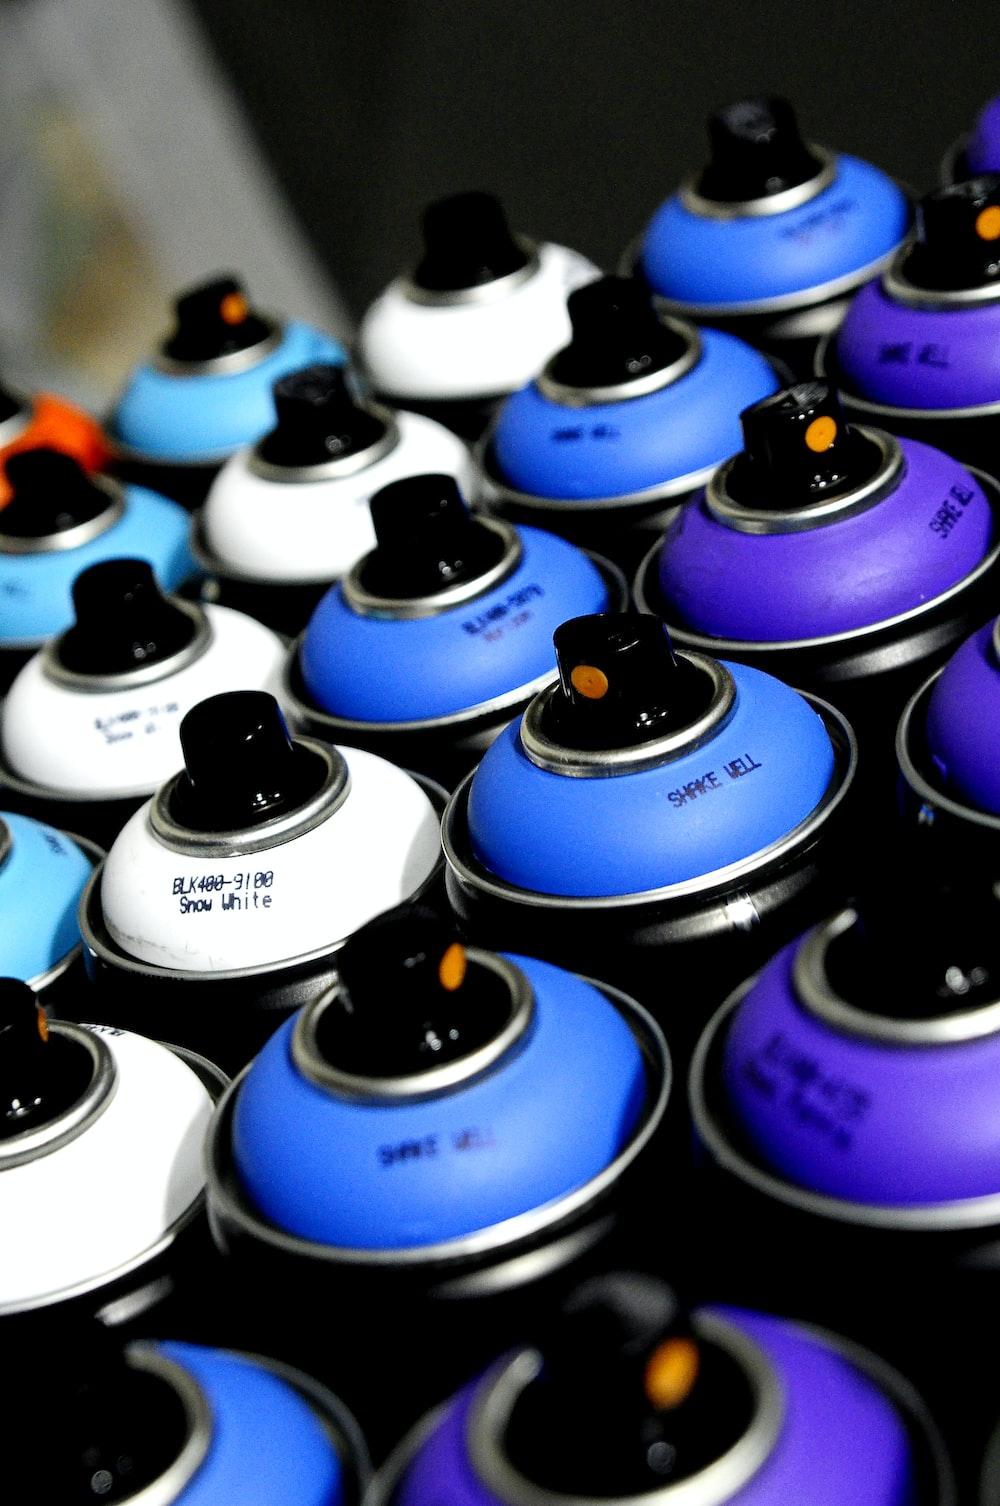 spray bottle lot